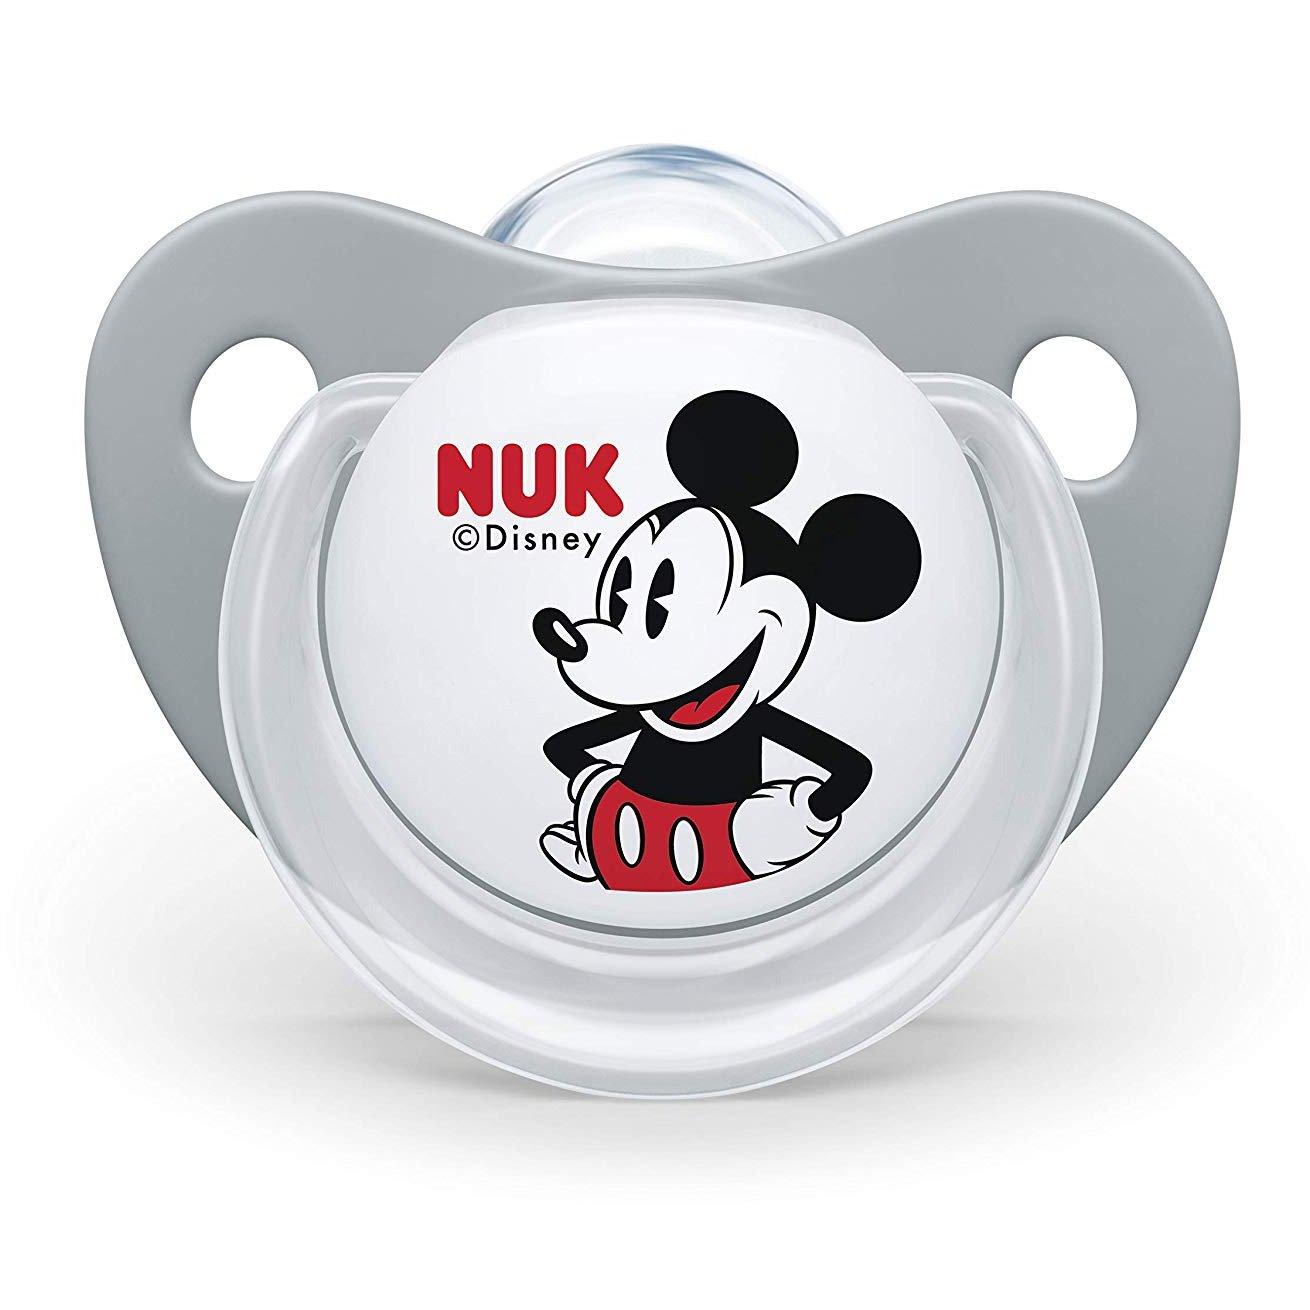 Nuk Trendline Disney Mickey Mouse Πιπίλα Σιλικόνης με Κρίκο 1 Τεμάχιο – 6-18 Μηνών Γκρι